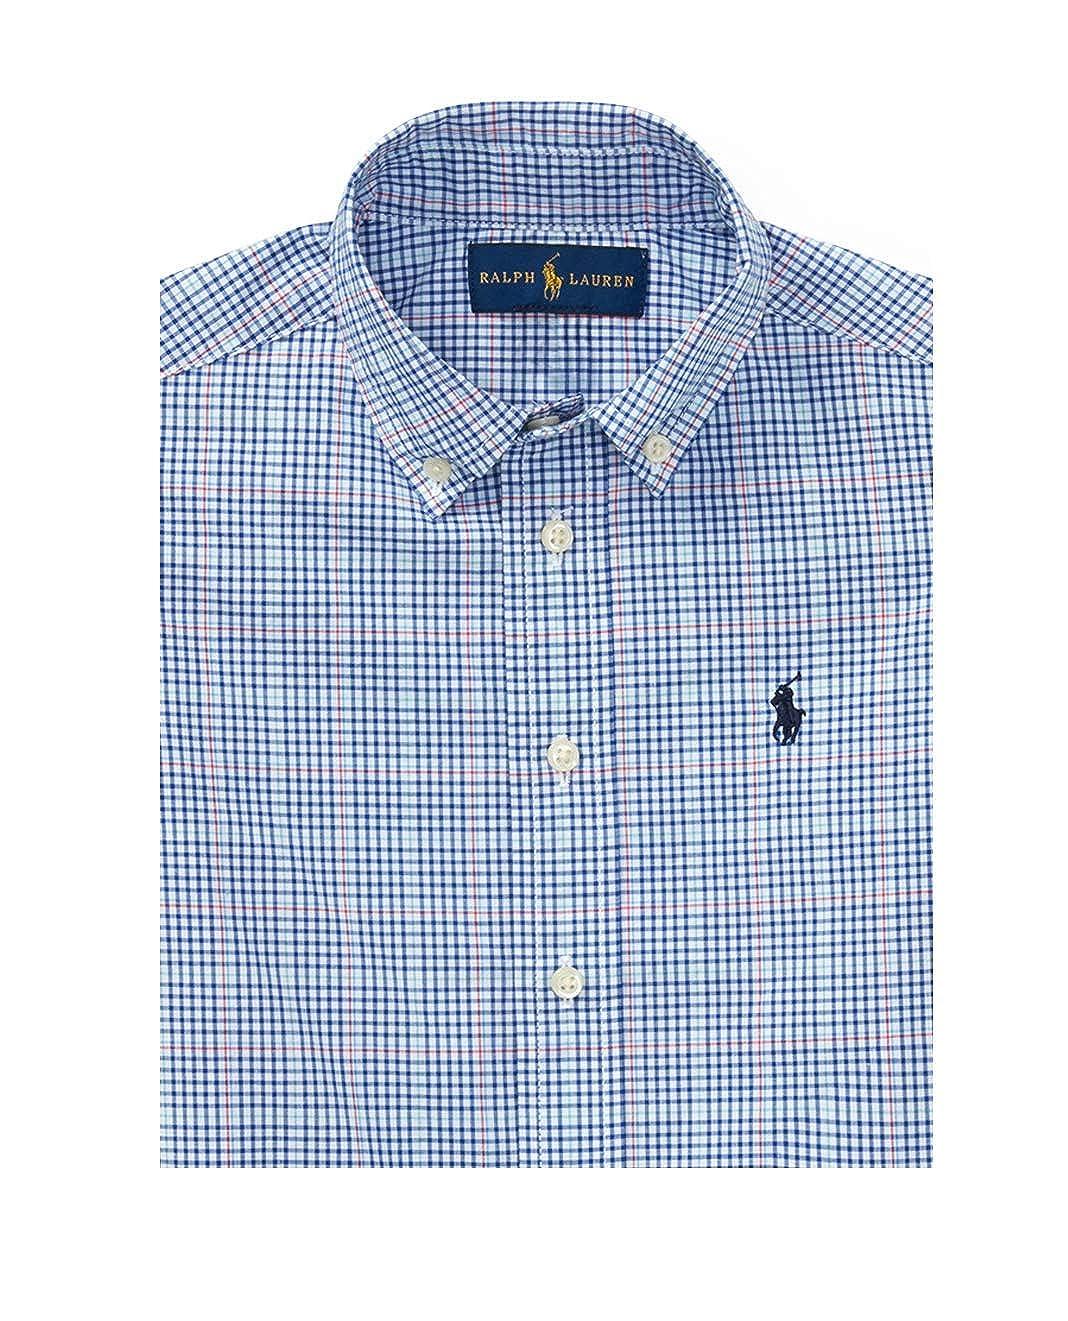 RALPH LAUREN Boy Plaid Cotton Long Sleeve POPLIN Button Down Shirt Size 7 Blue Multi